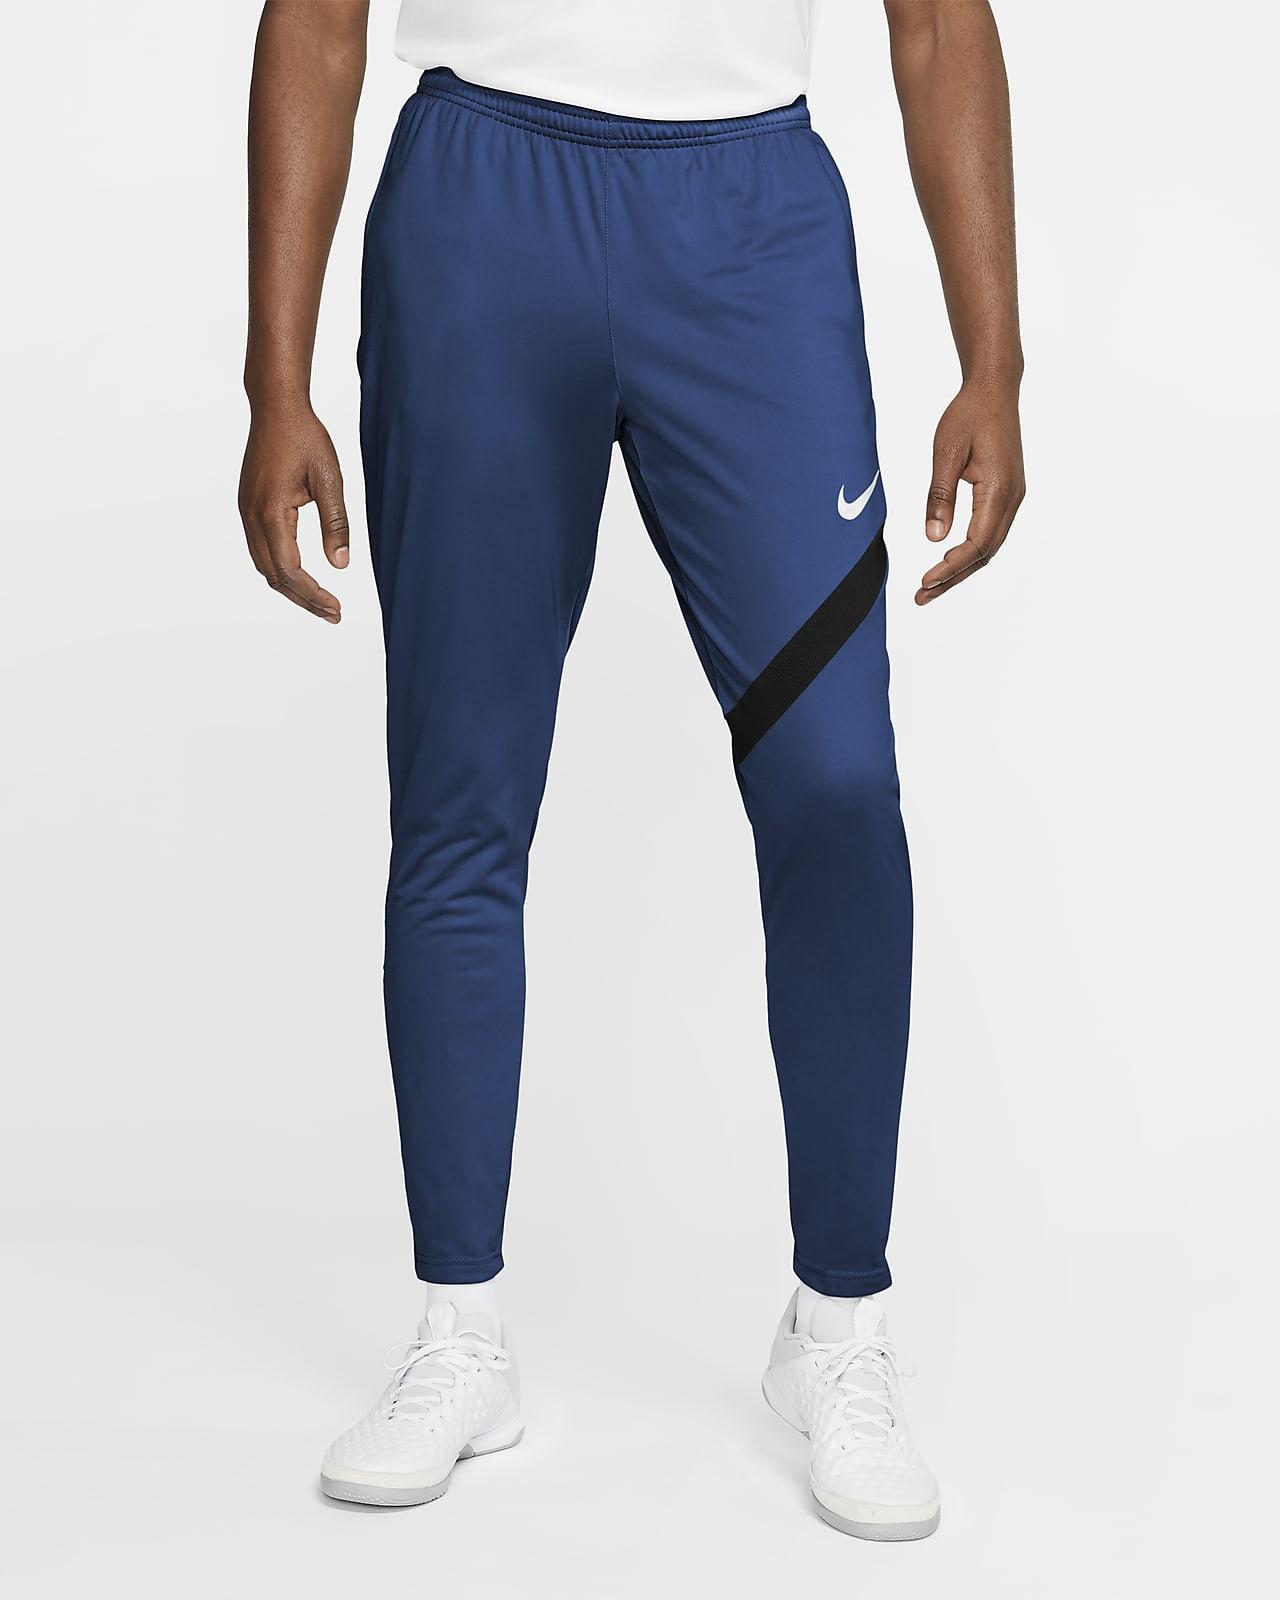 Pantalones de fútbol para hombre Nike Dri-FIT Academy Pro